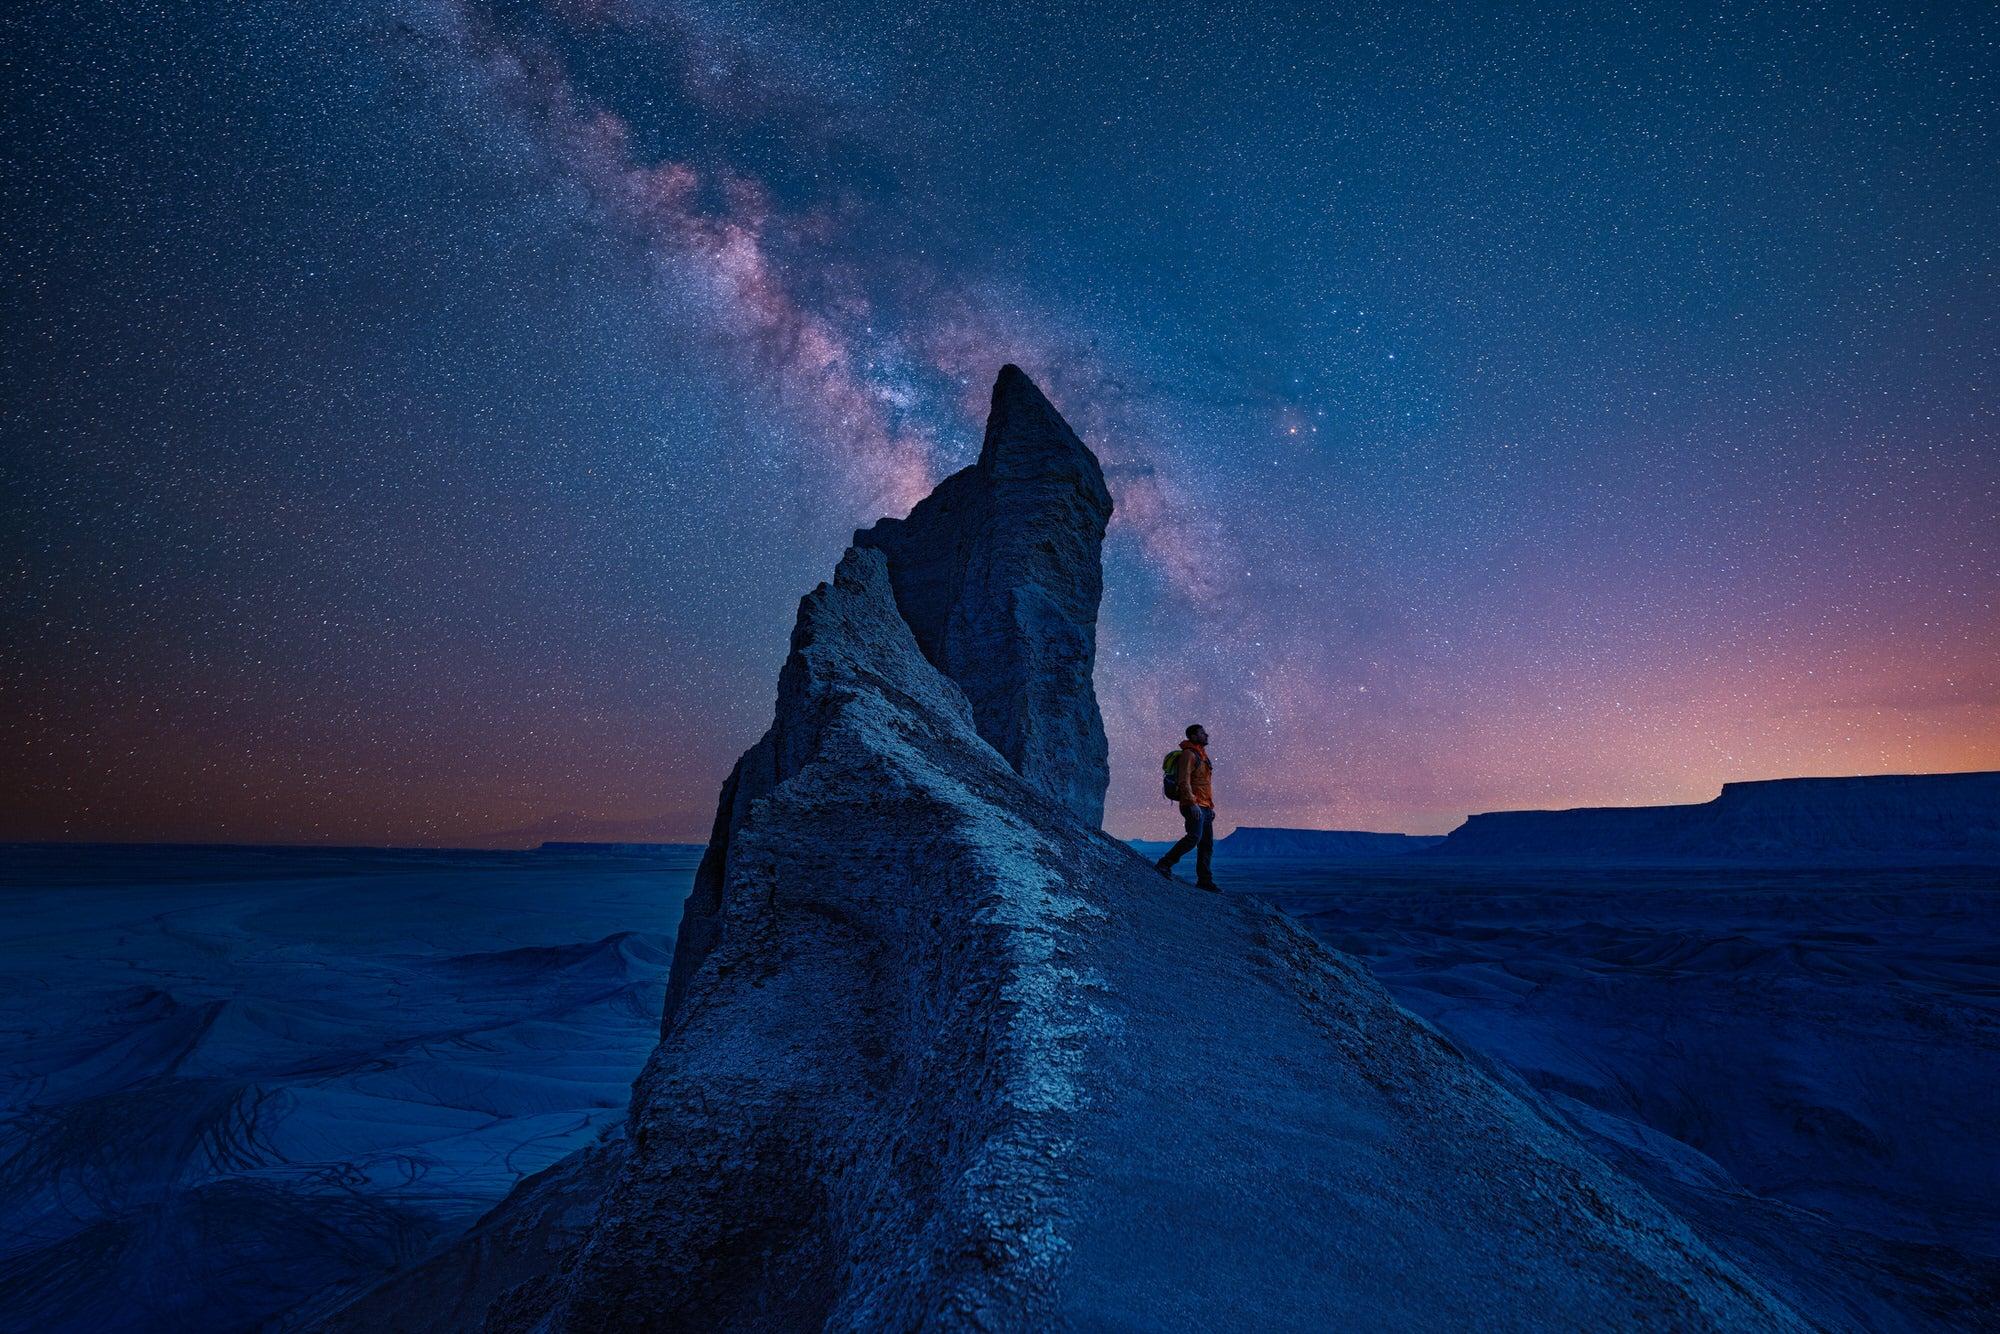 Sony-Alpha-Universe-Photo-By-Stan-Moniz-14mm-F18-GM-3.jpg